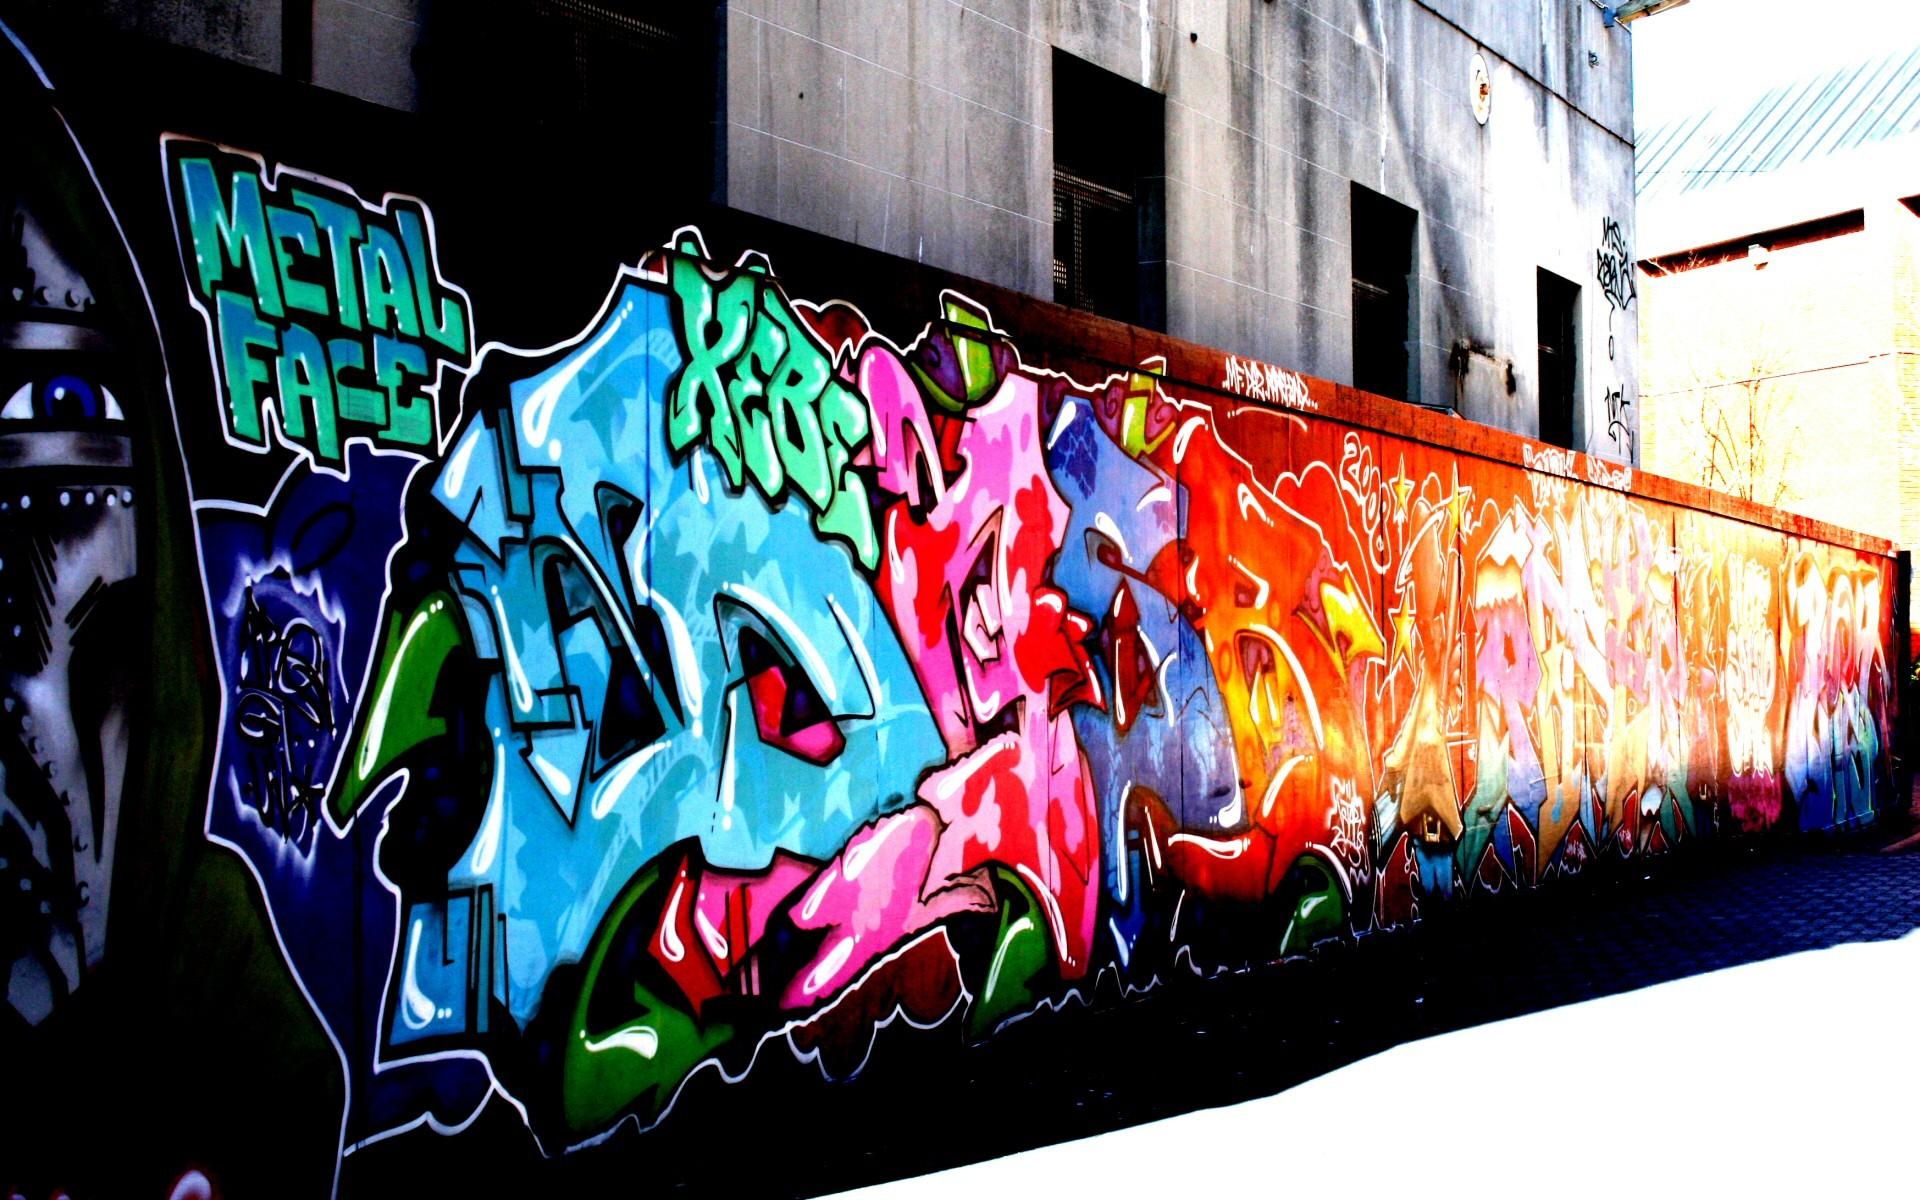 обои на телефон граффити на стенах другой